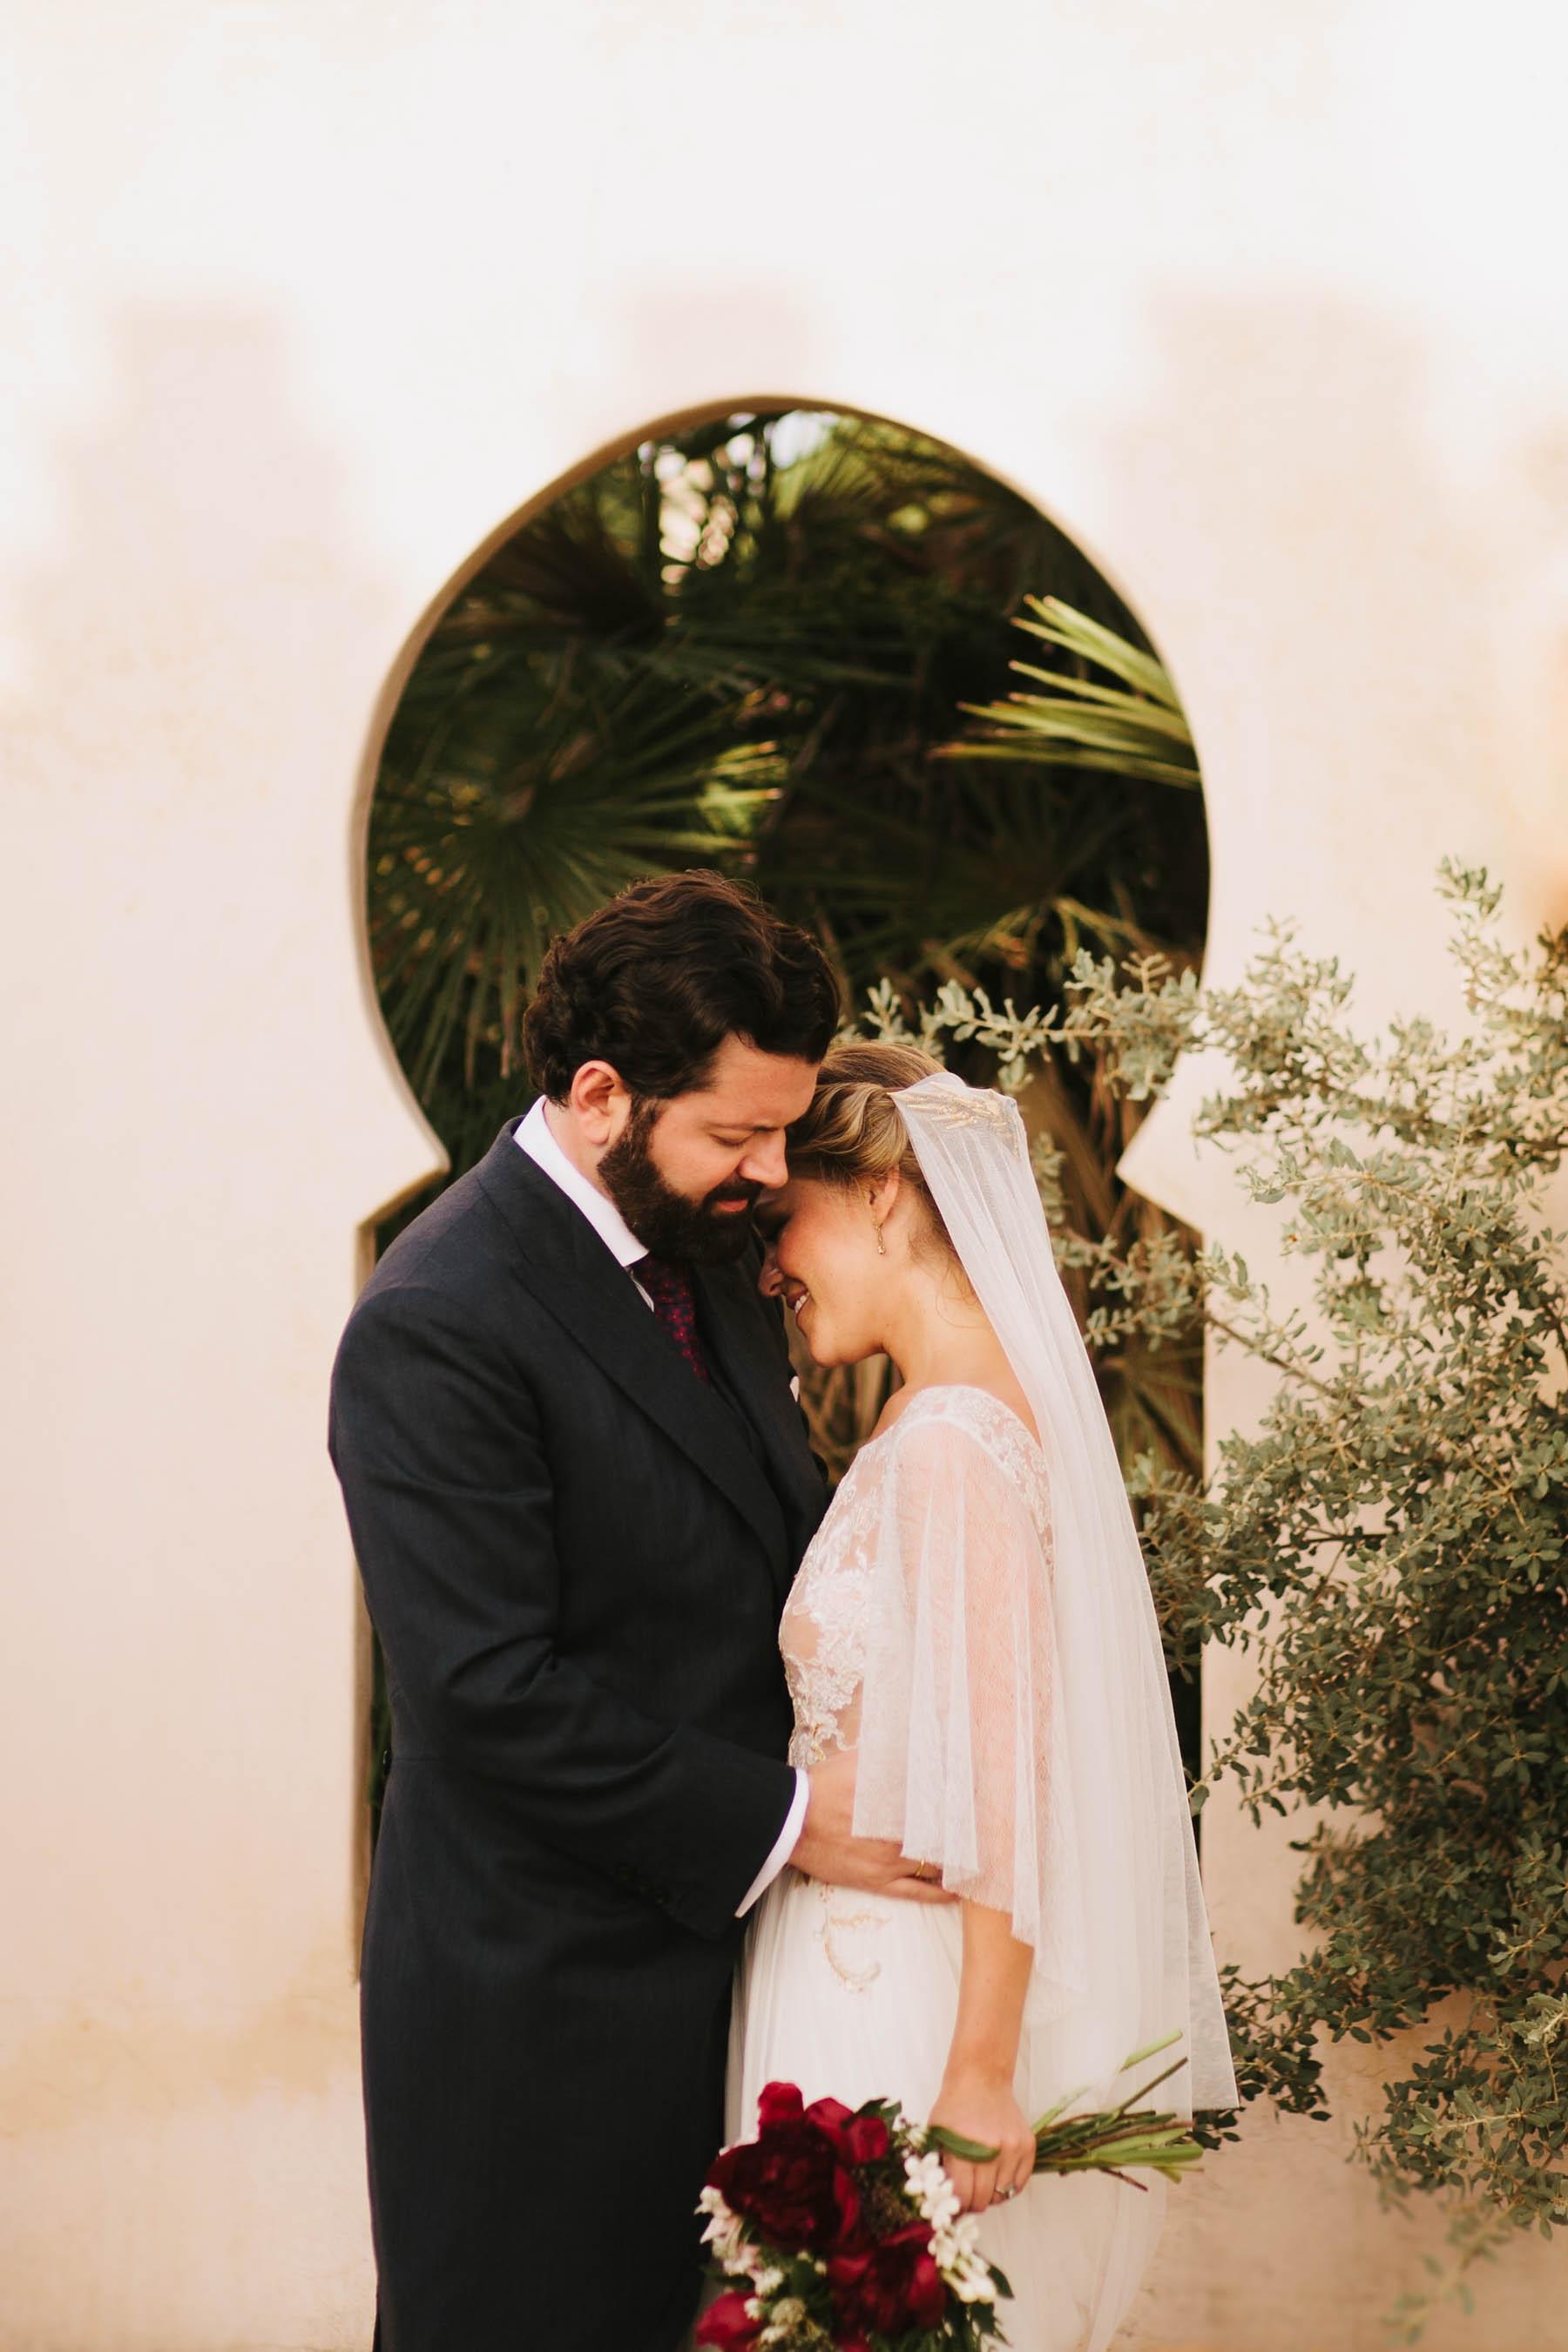 fotografo de bodas Jairo Crena-238